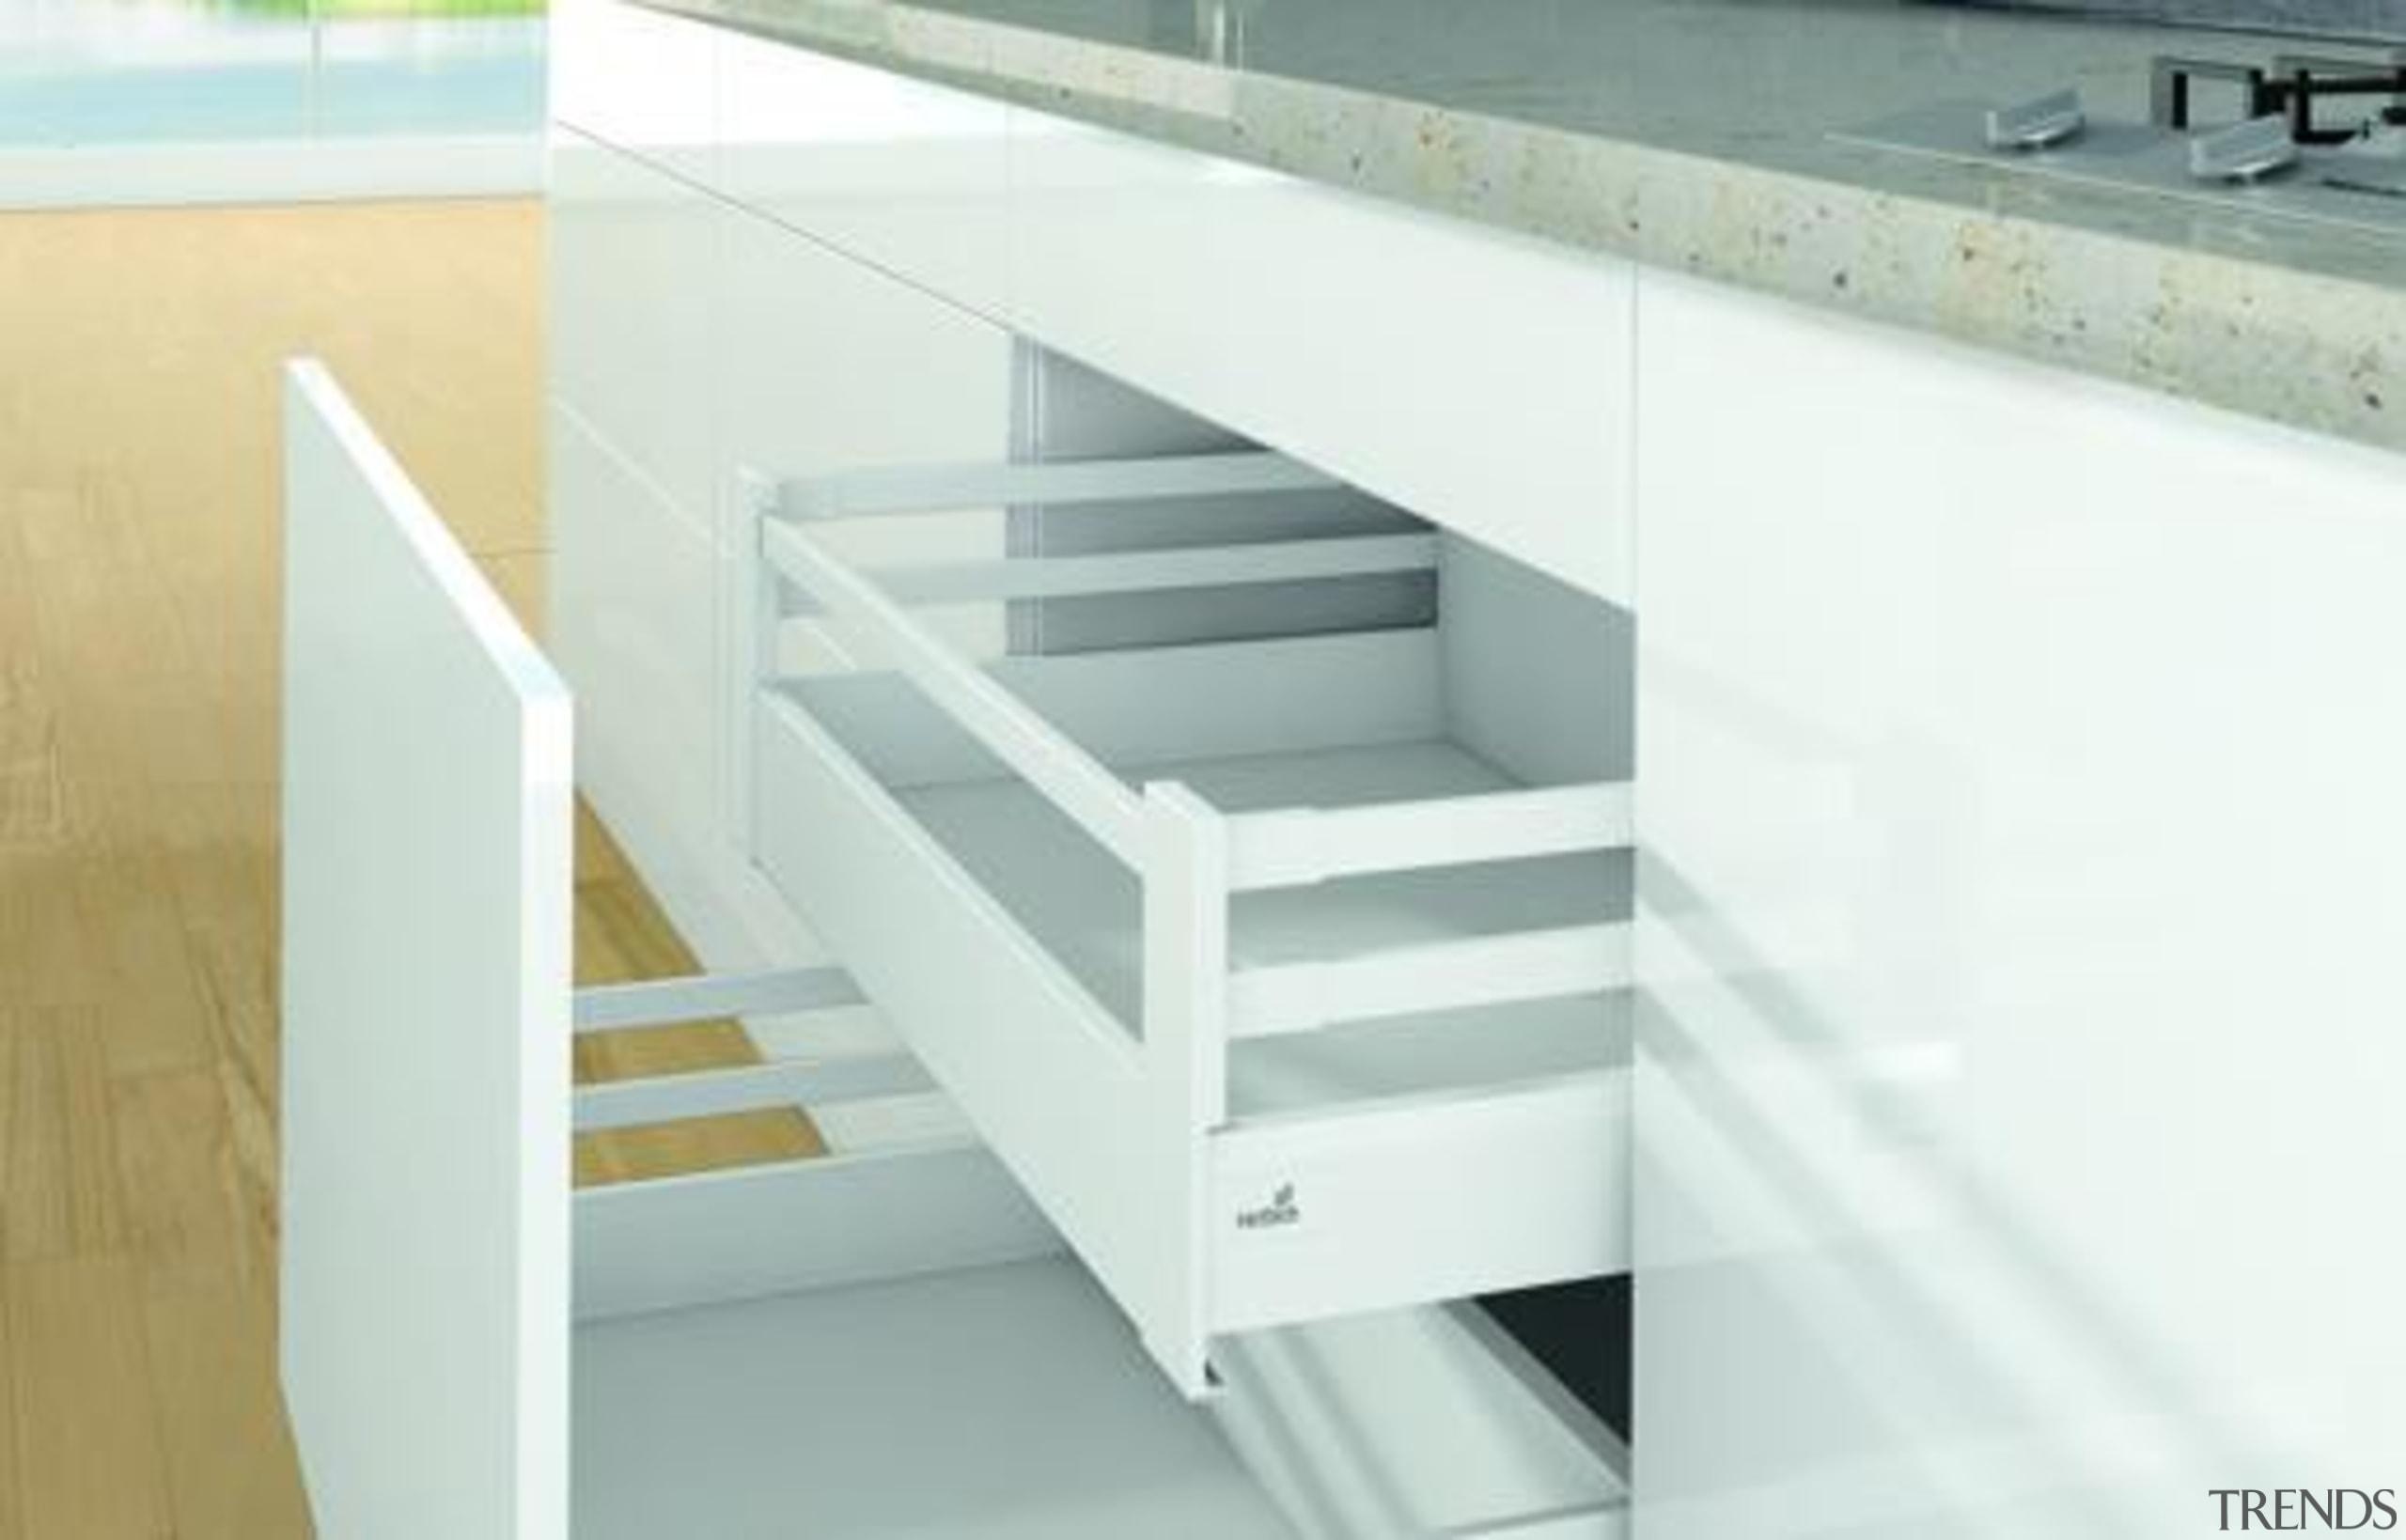 Pot & Pan Drawers - Pot & Pan furniture, handrail, product, product design, shelf, shelving, stairs, white